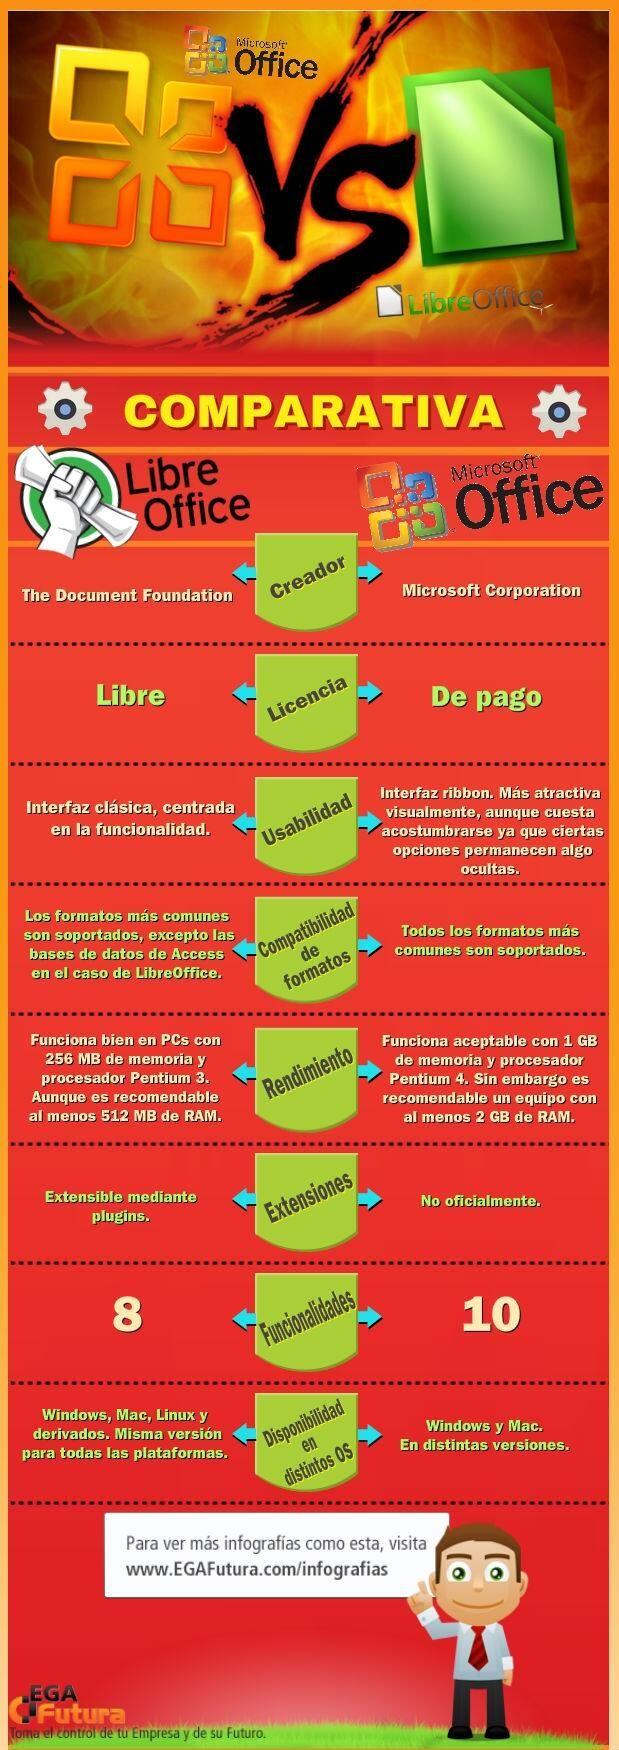 LibreOffice vs Microsoft Office vía www.EGAfutura.com #infografia #infographic #software